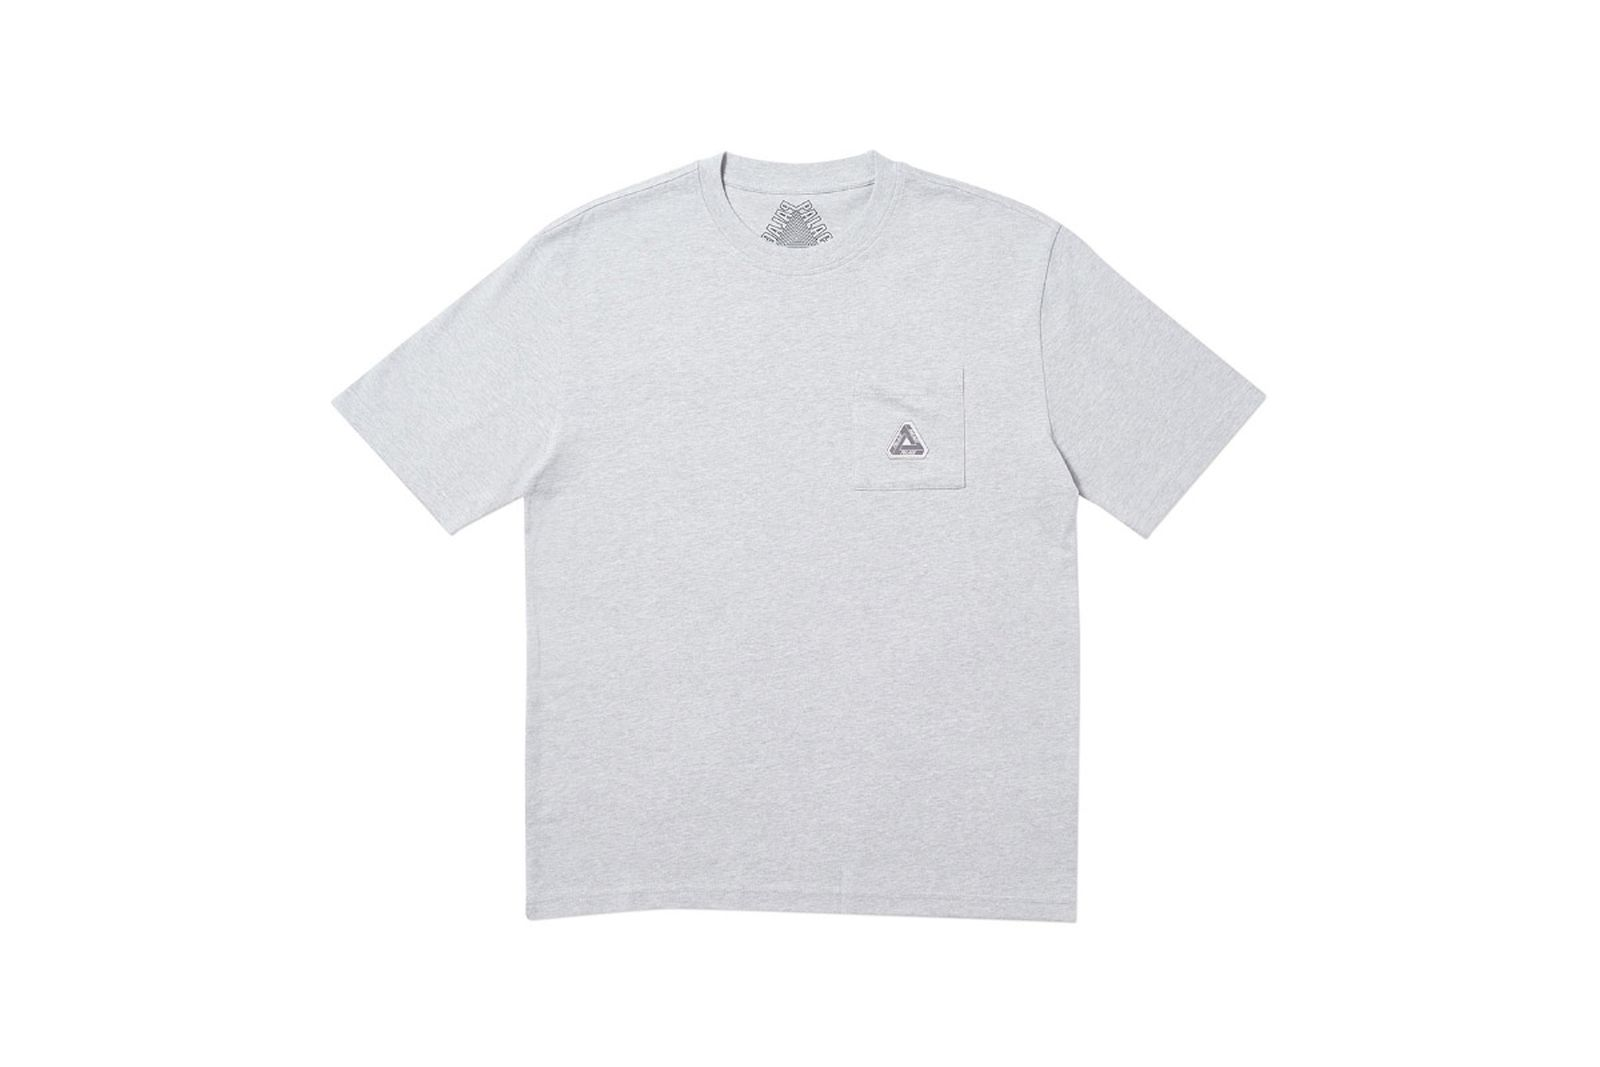 Palace 2019 Autumn T Shirt Pocket grey marl